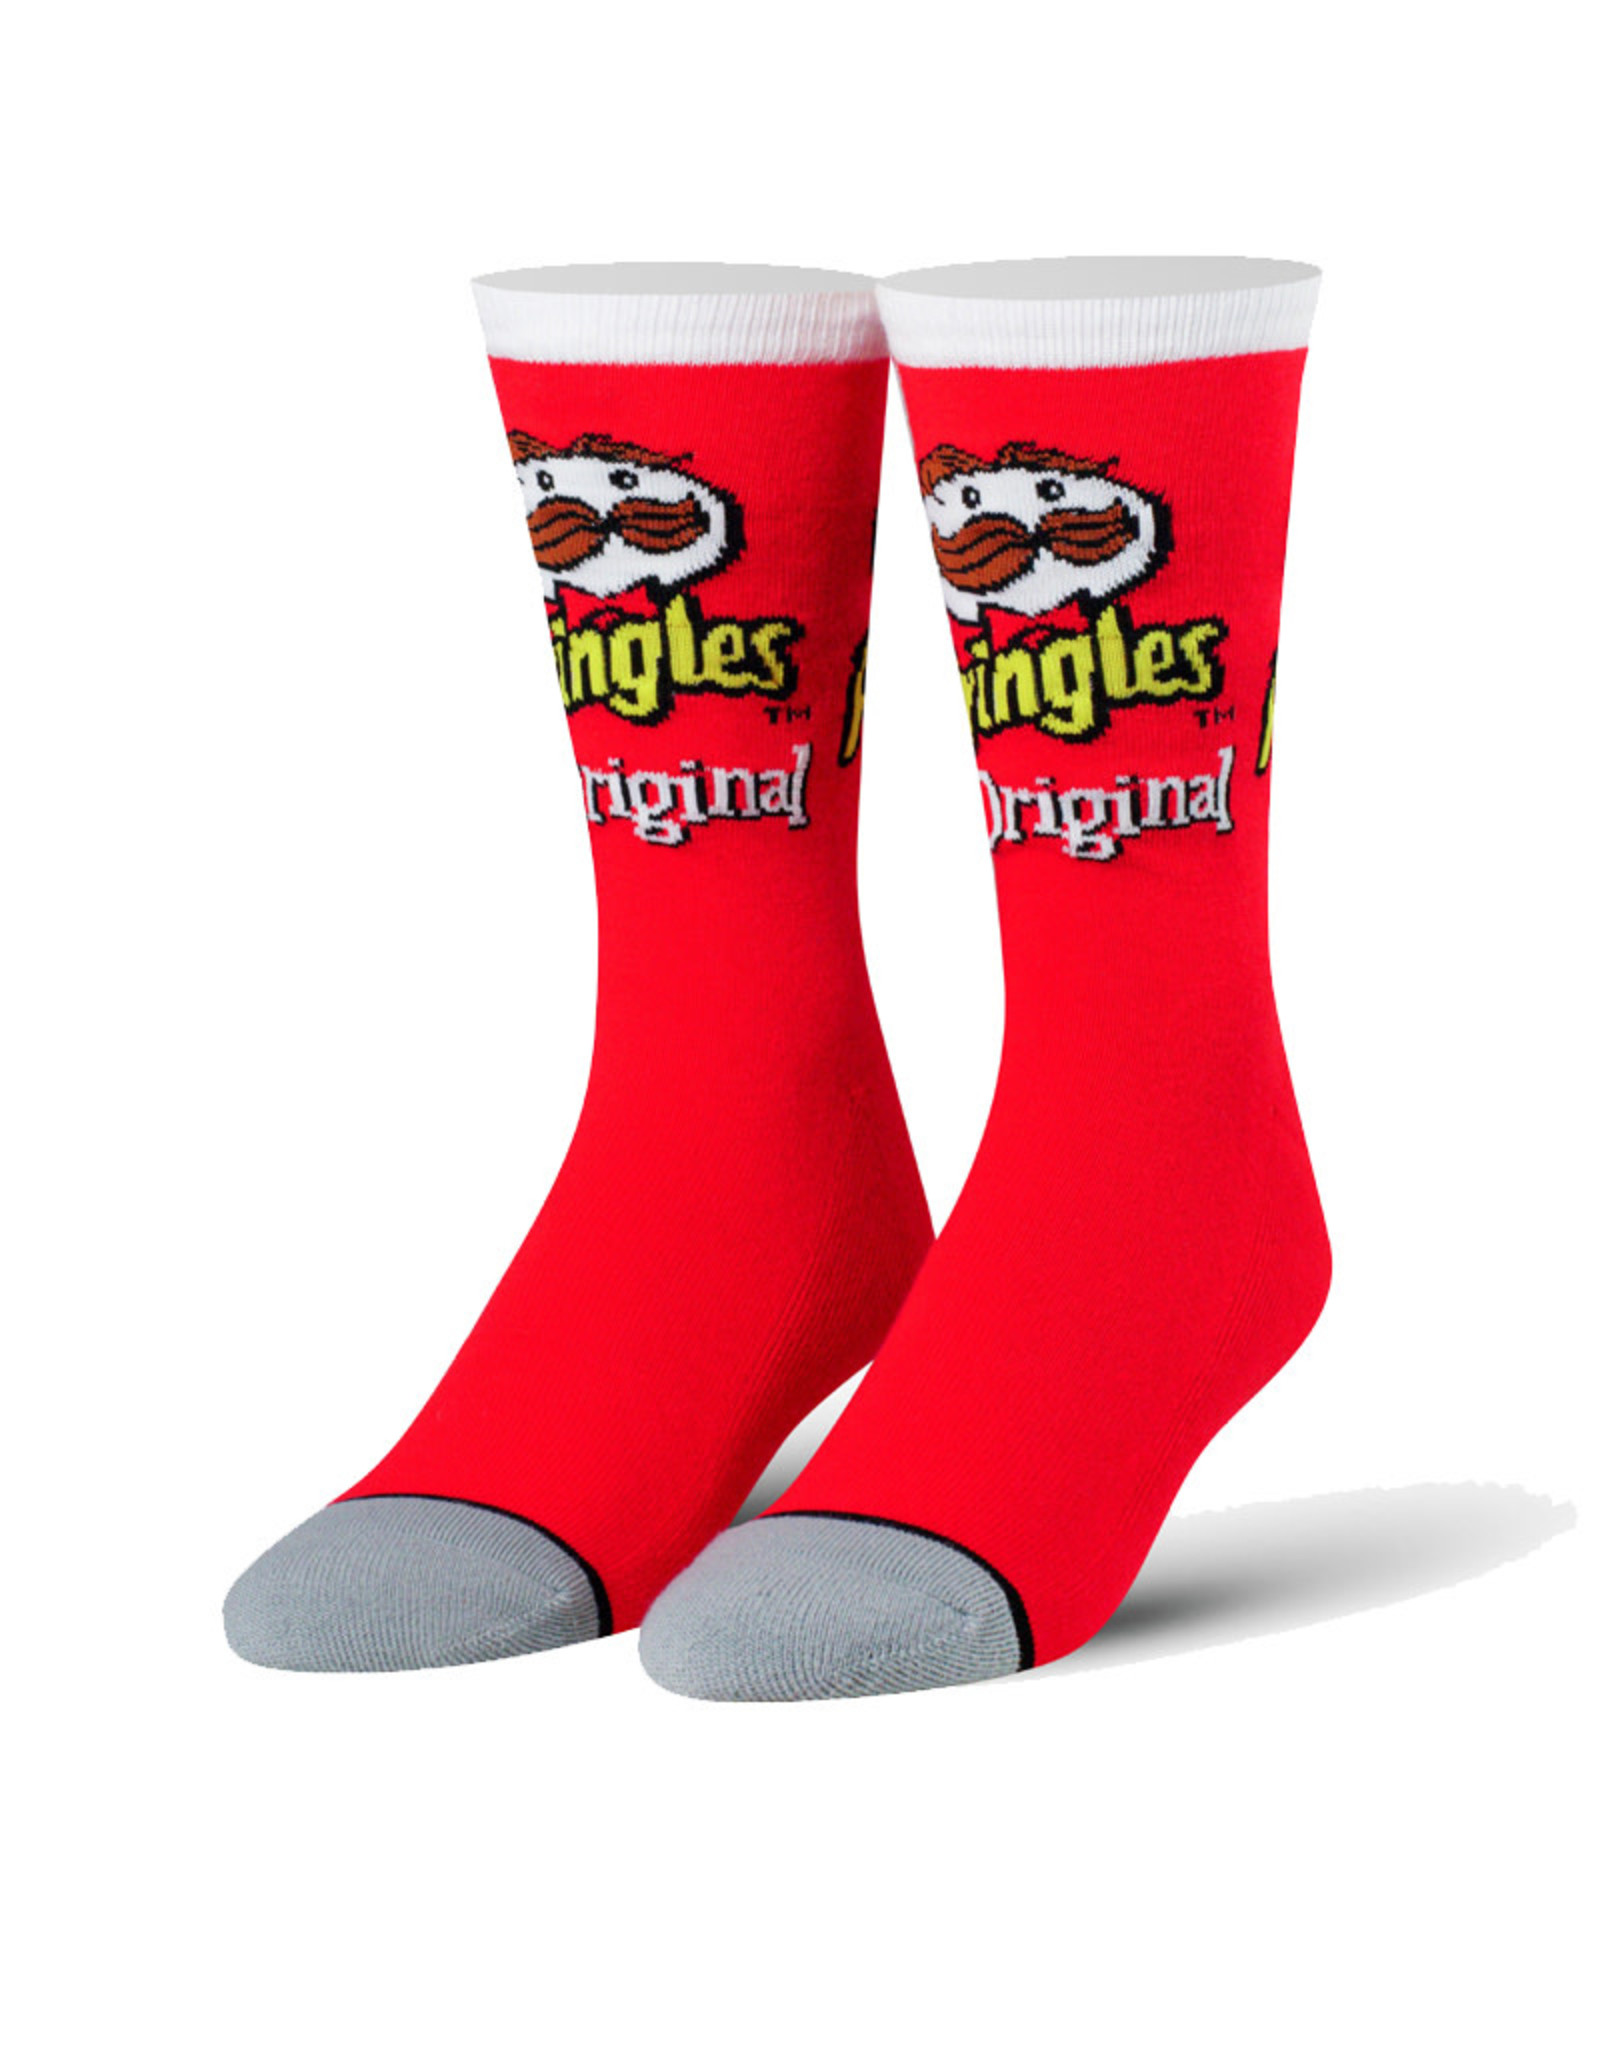 Pringles ( Cool Socks Sock ) Original